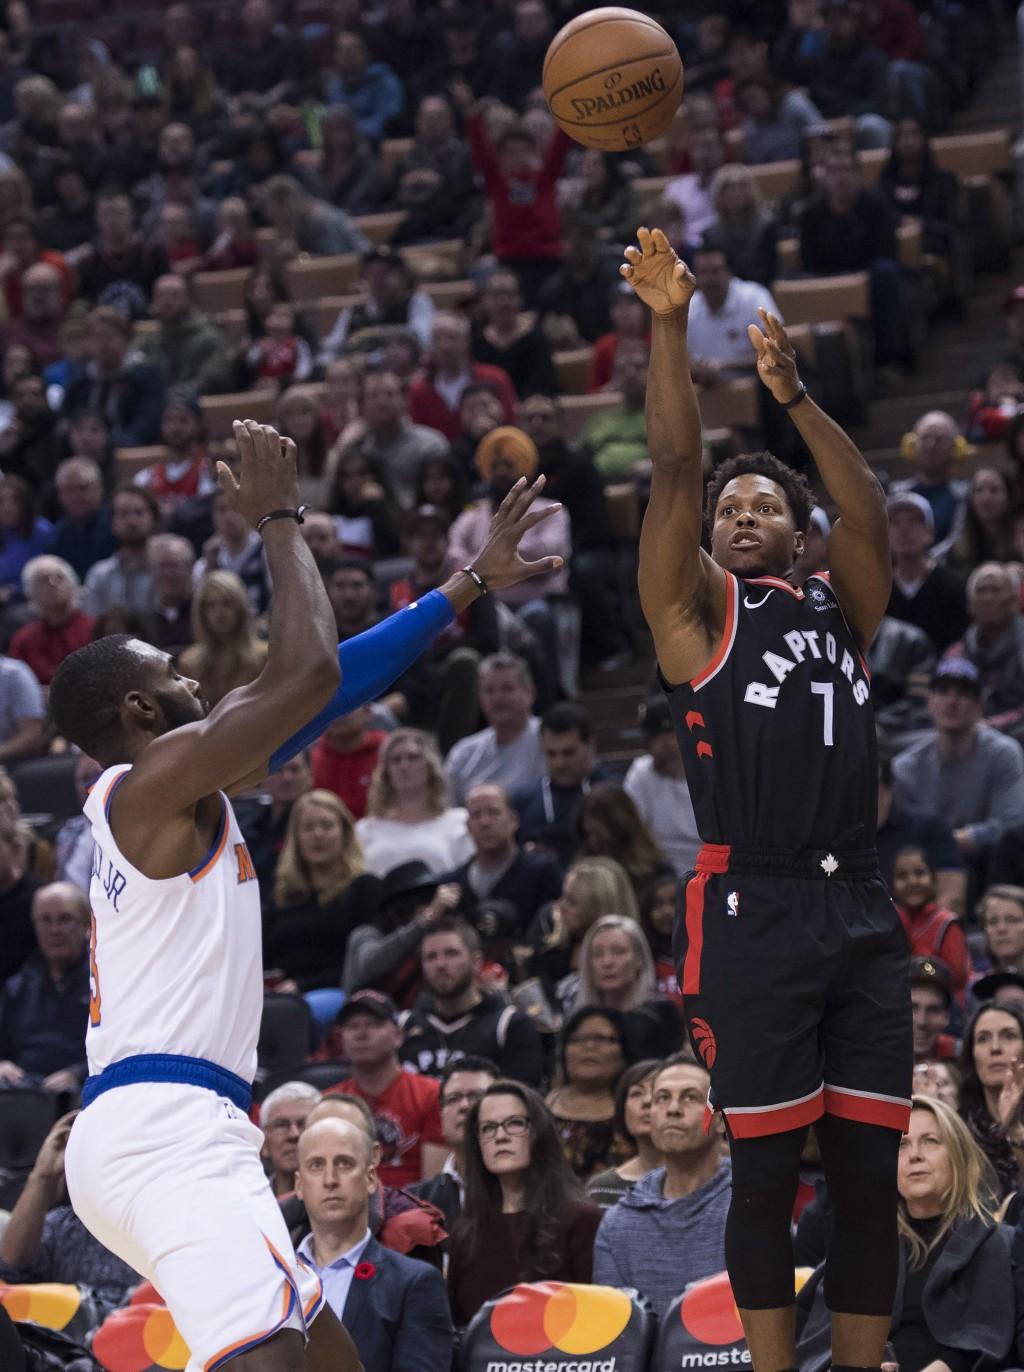 Toronto Raptors guard Kyle Lowry (7) shoots past New York Knicks guard Tim Hardaway Jr. (3) during first half NBA basketball action in Toronto on Satu